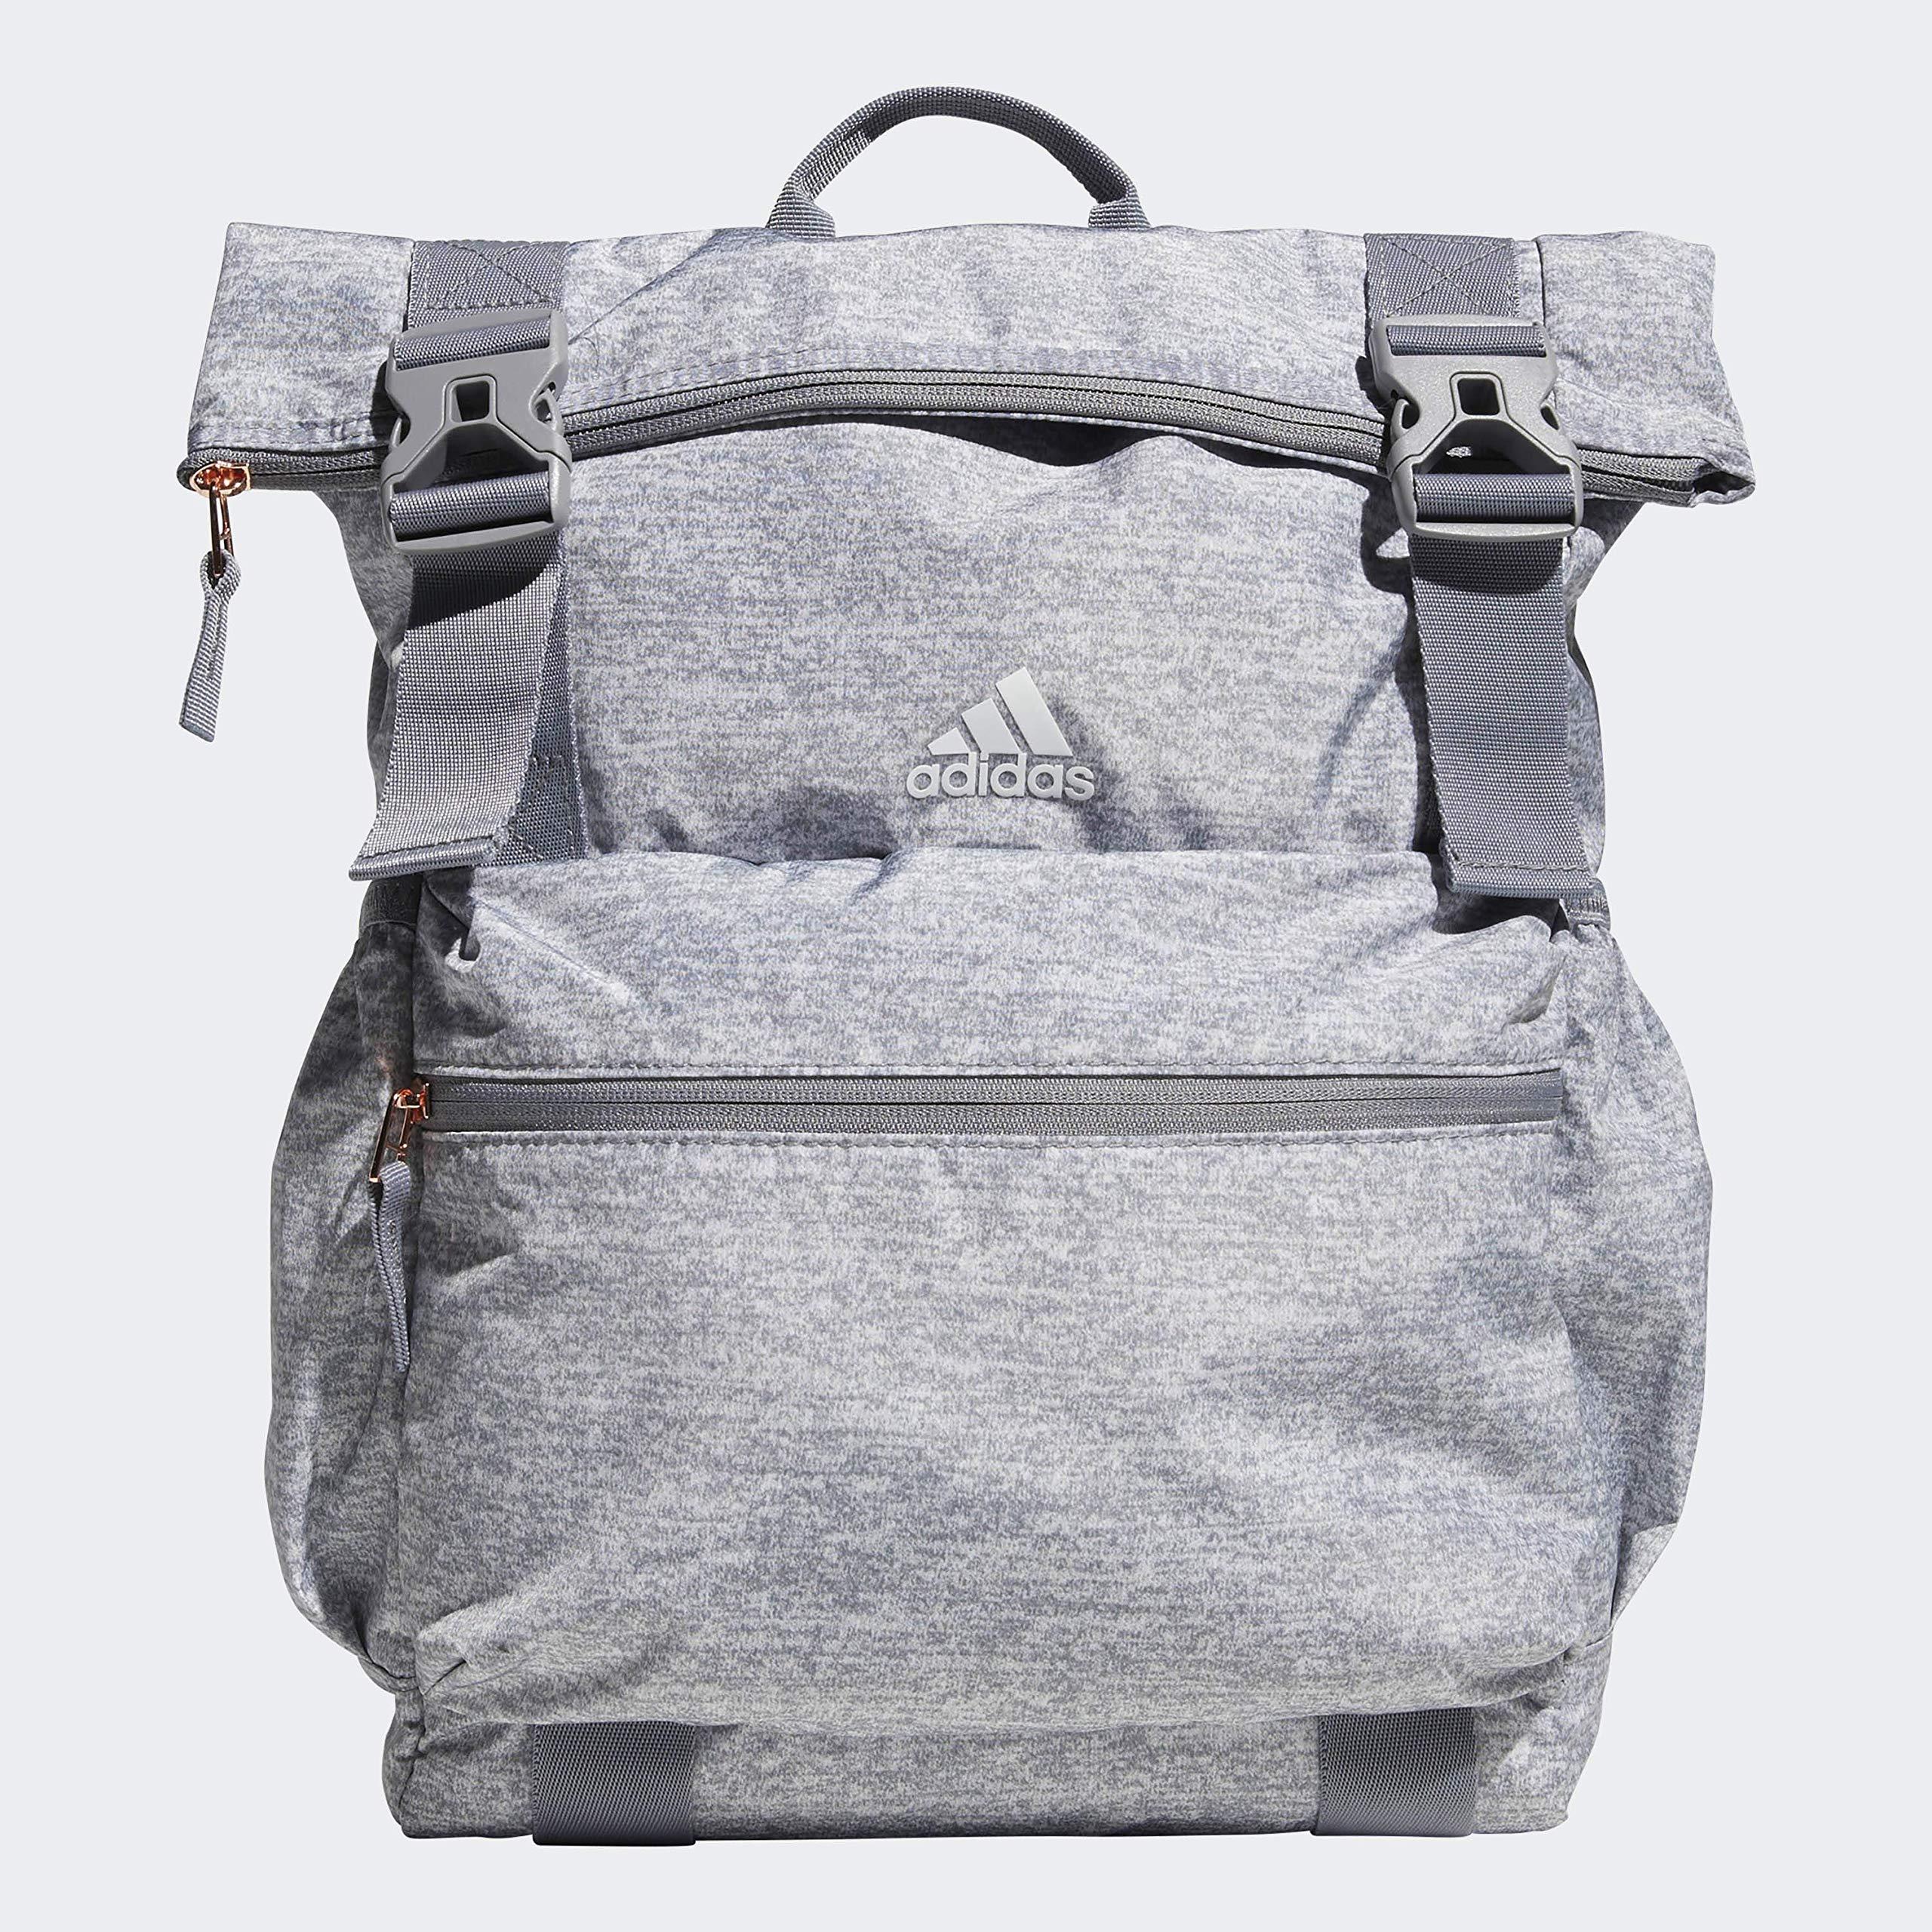 adidas Unisex Yola Backpack, Light Jersey/Grey/Rose